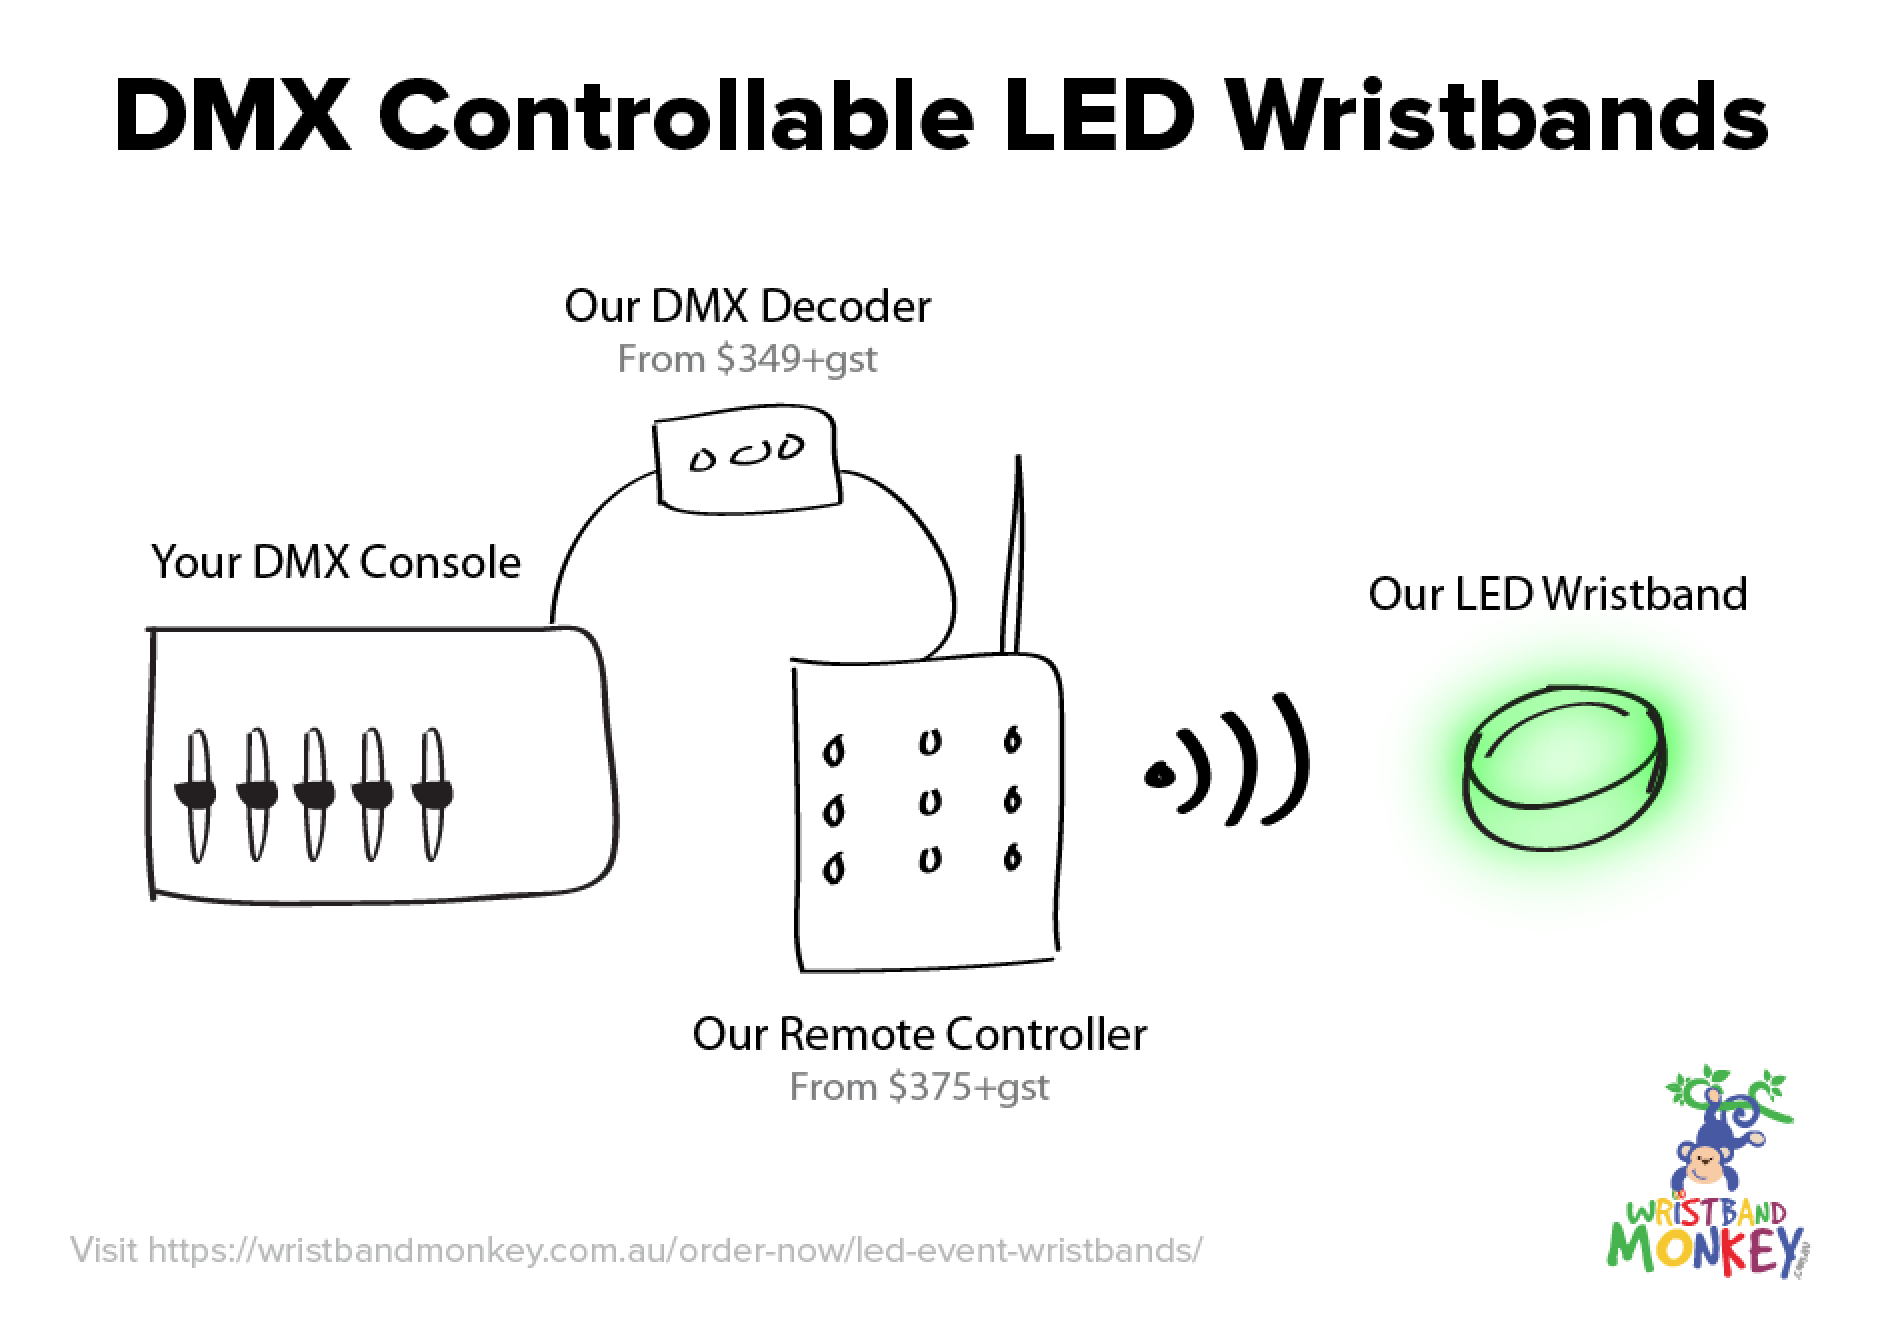 DMX Controllable Wrist band